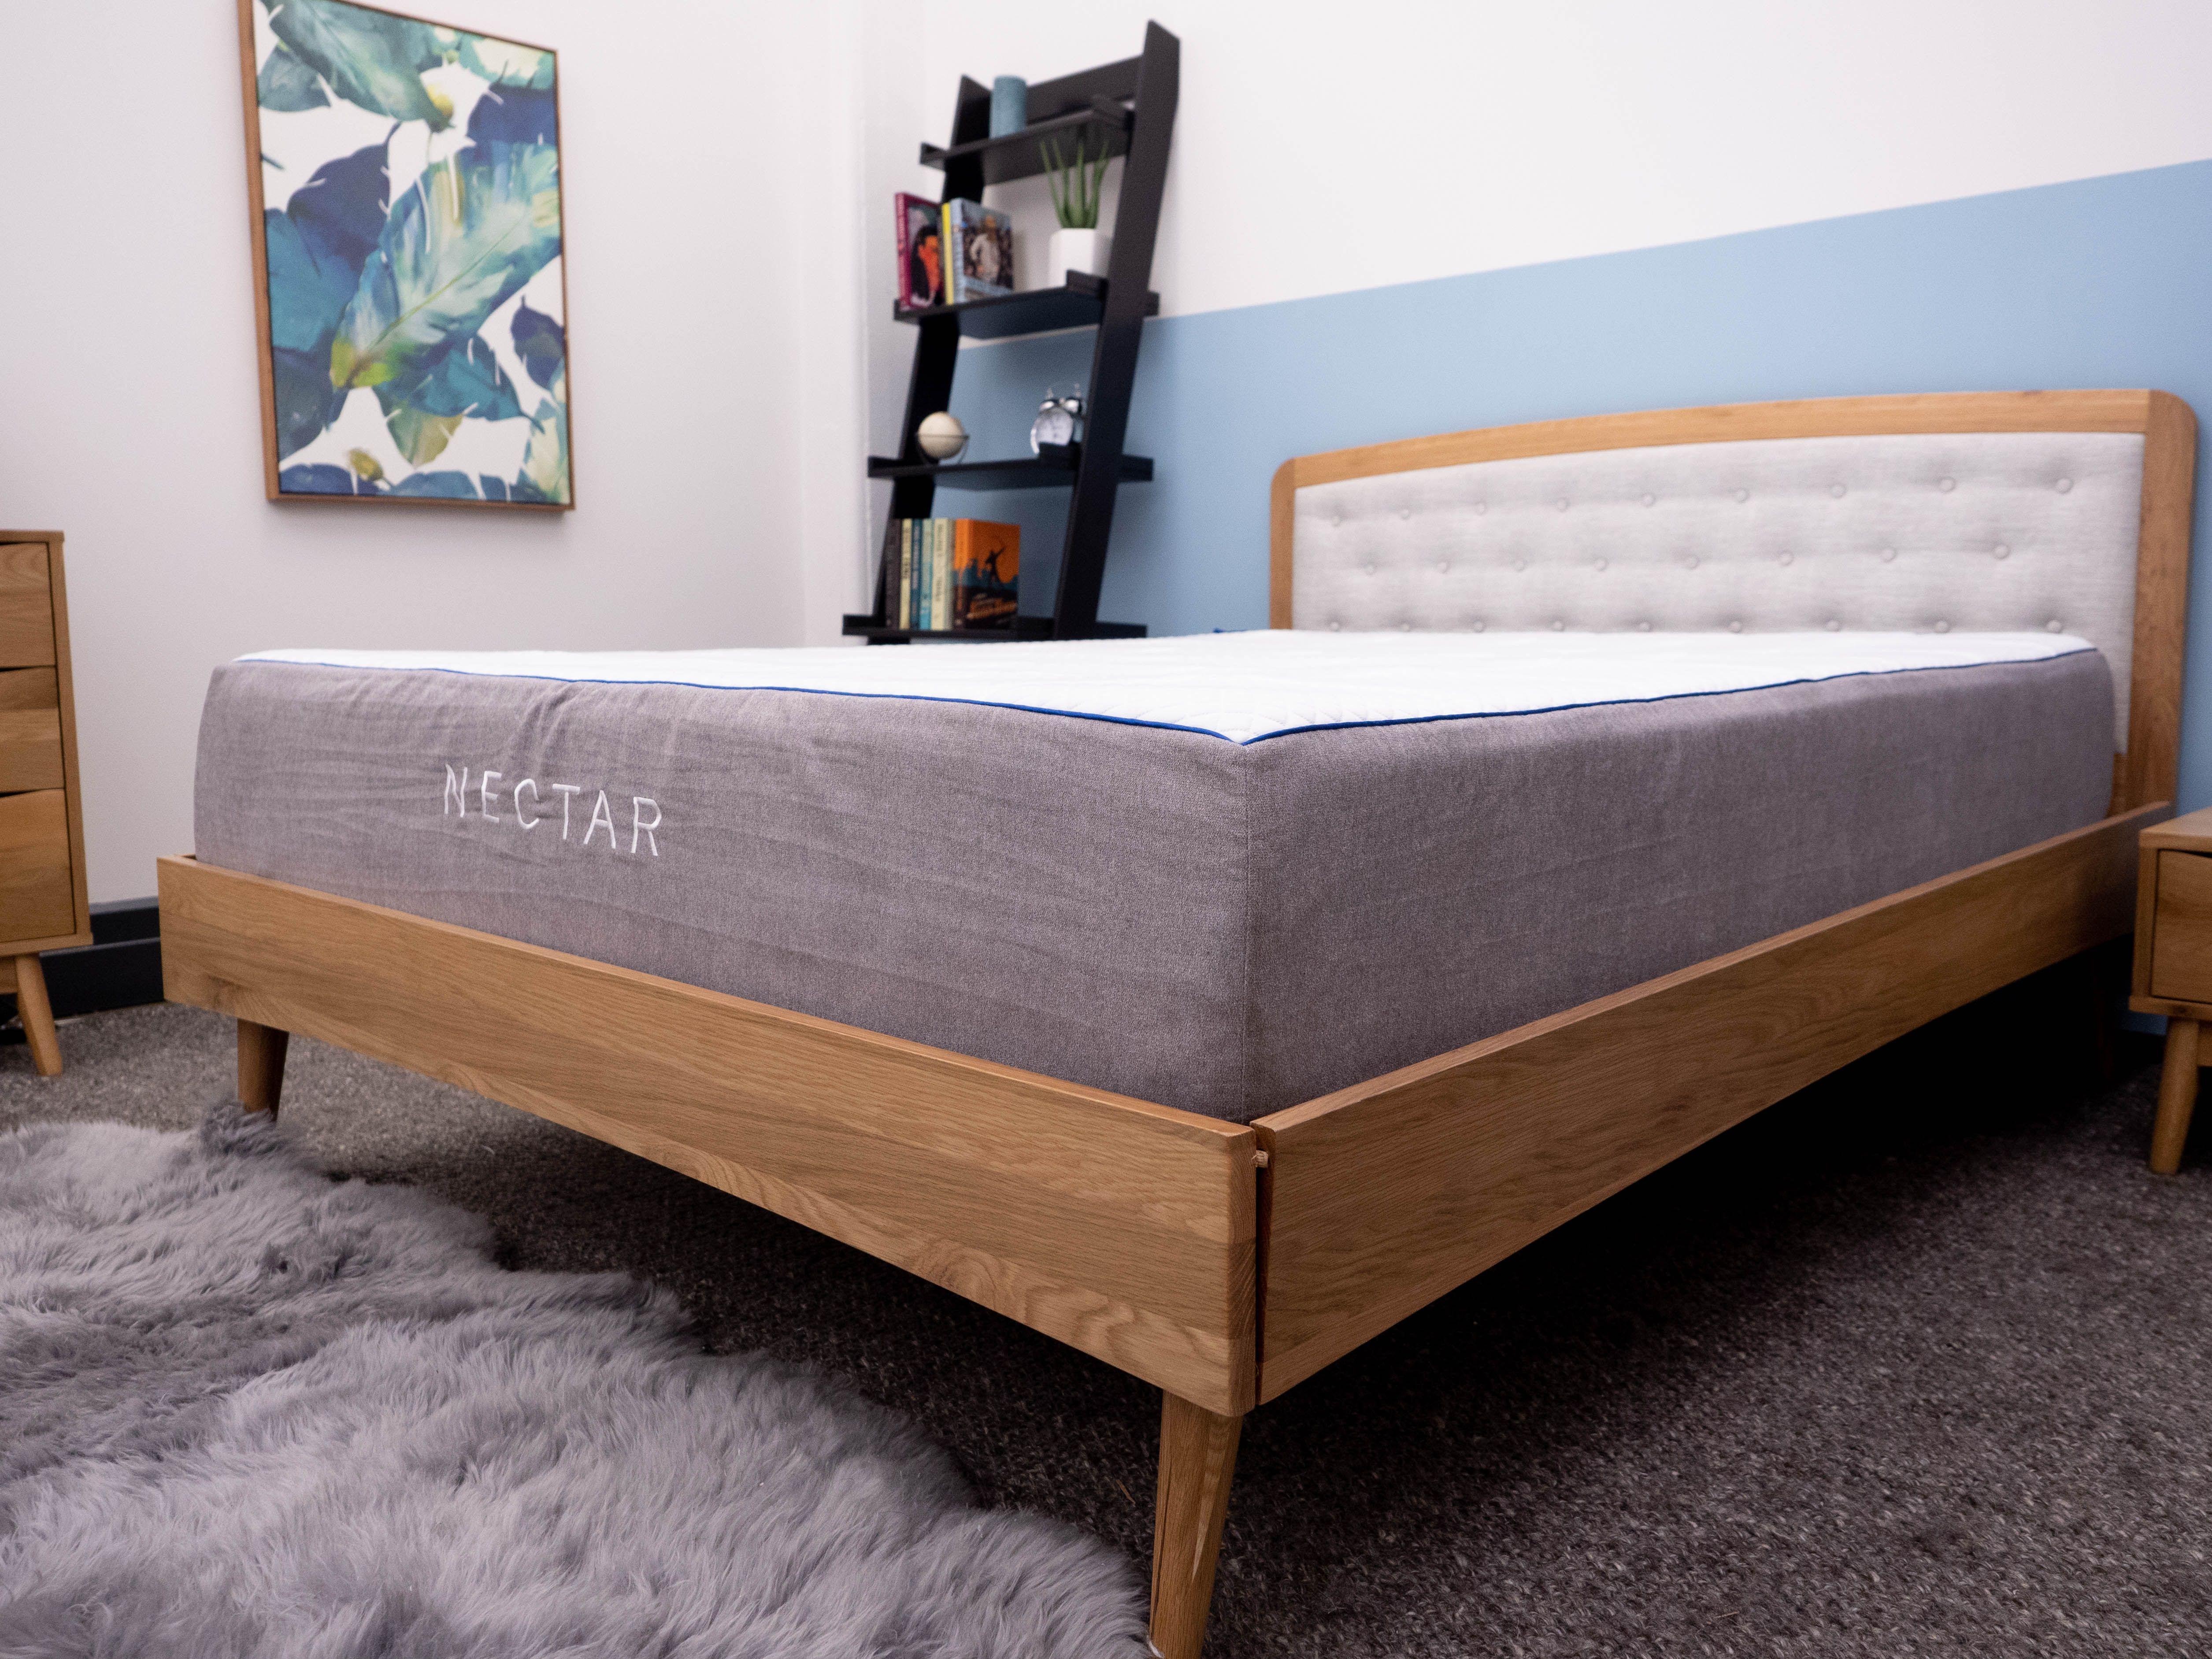 Nectar Mattress Giveaway Mattress Giveaway Mattress Sales